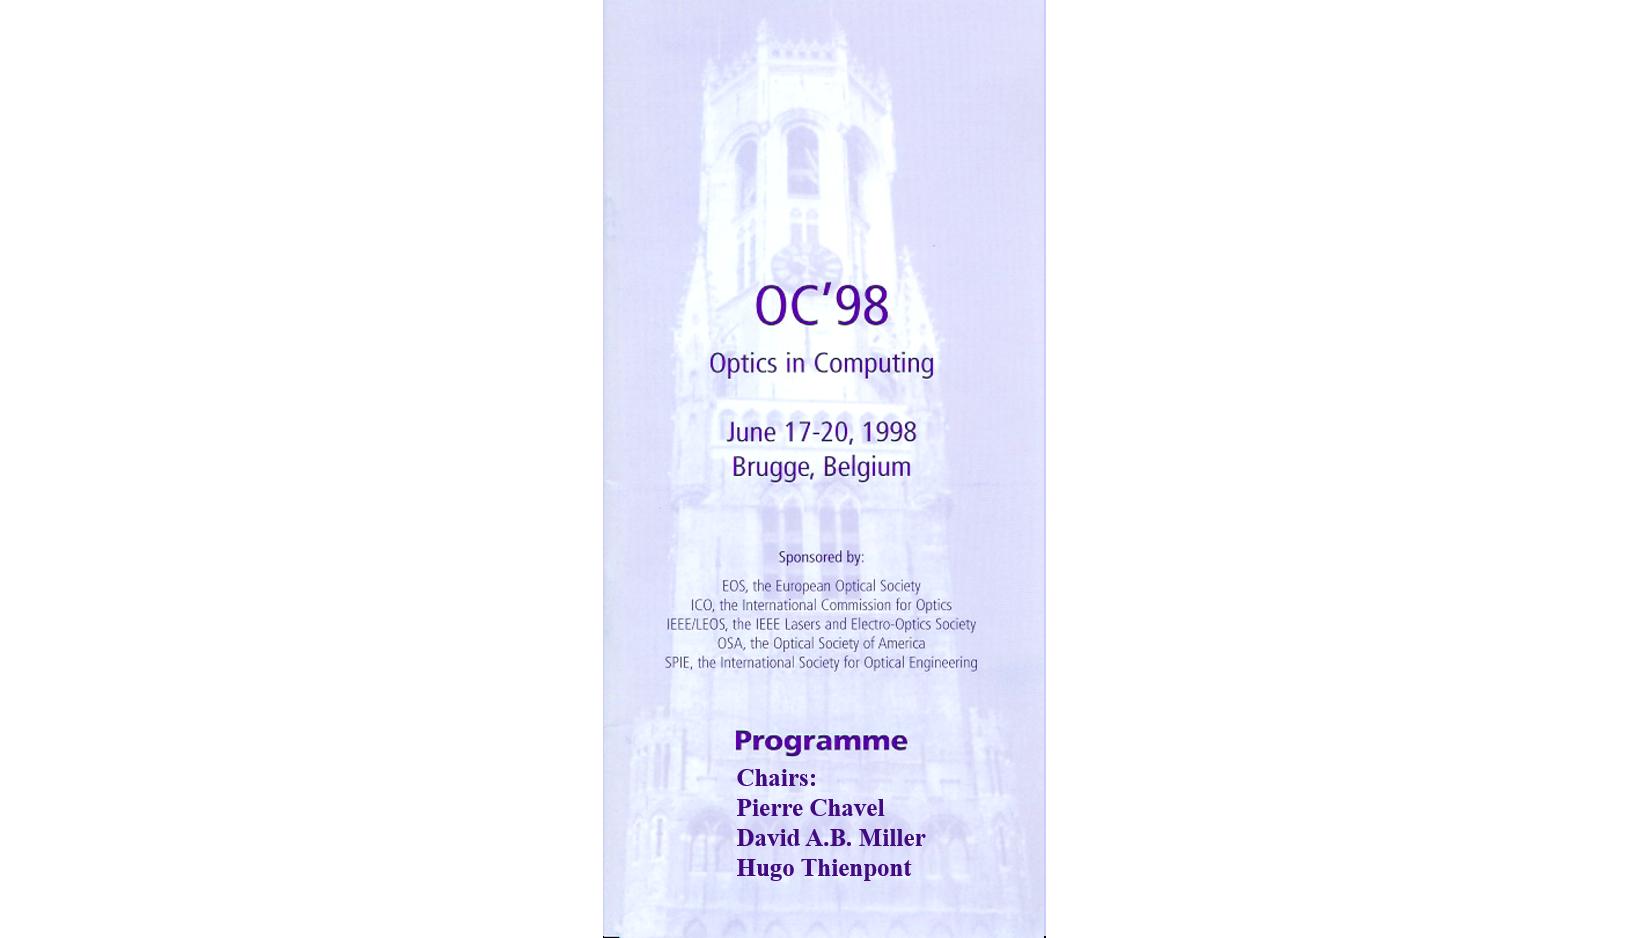 OC98 flyer2